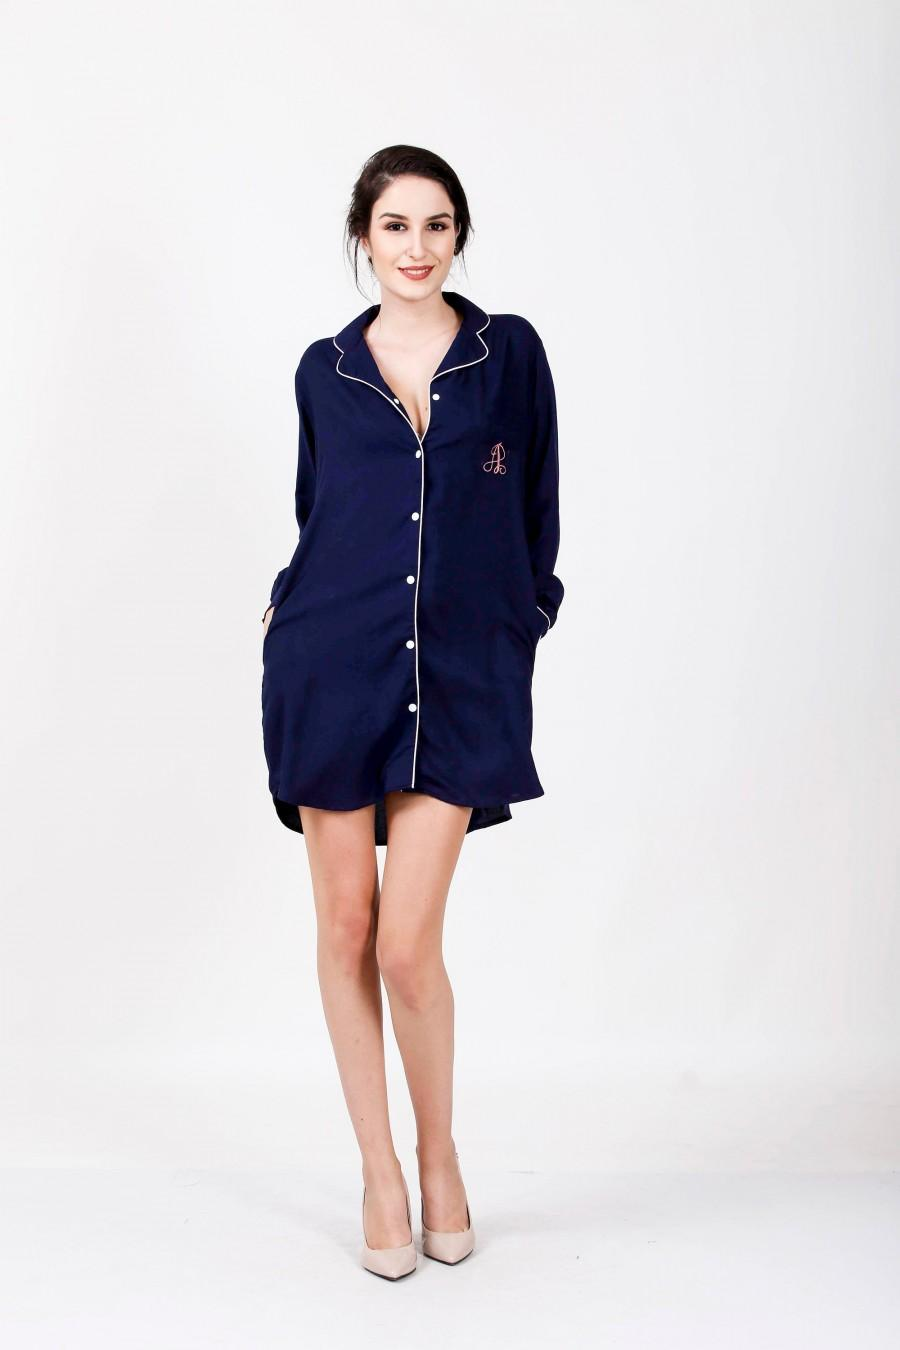 Mariage - NAVY Blue Boyfriend shirt, Sleep shirt Women, Cotton Nightwear, Loose Sleepwear, Lounge Cloth, Casual wear, beach wear